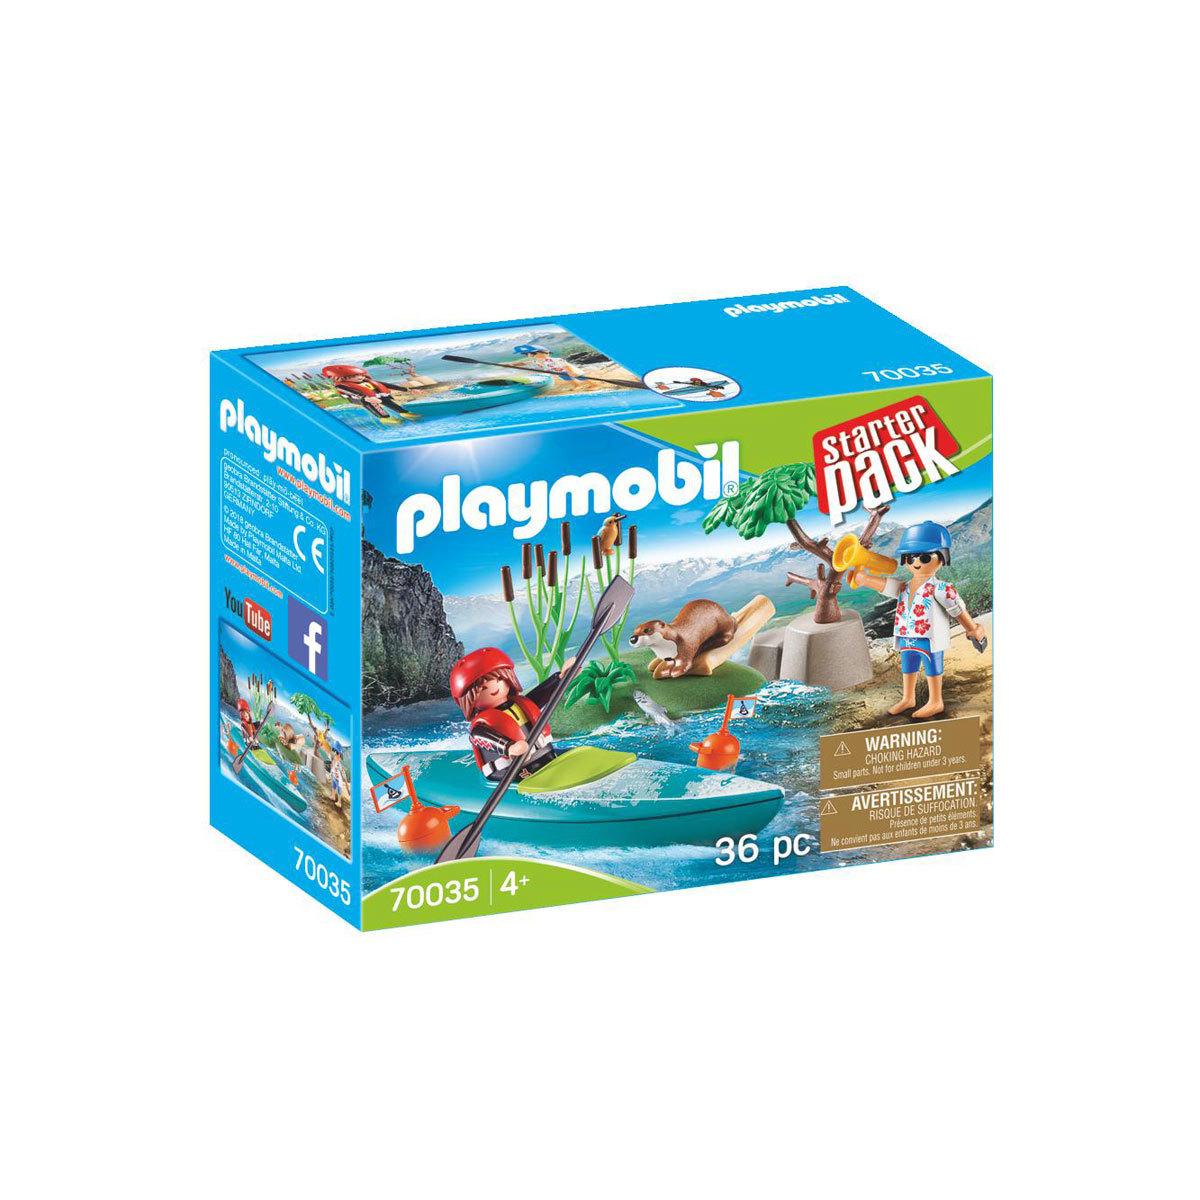 Playmobil 70035 Kayak Adventure Starter Pack from Early Learning Center